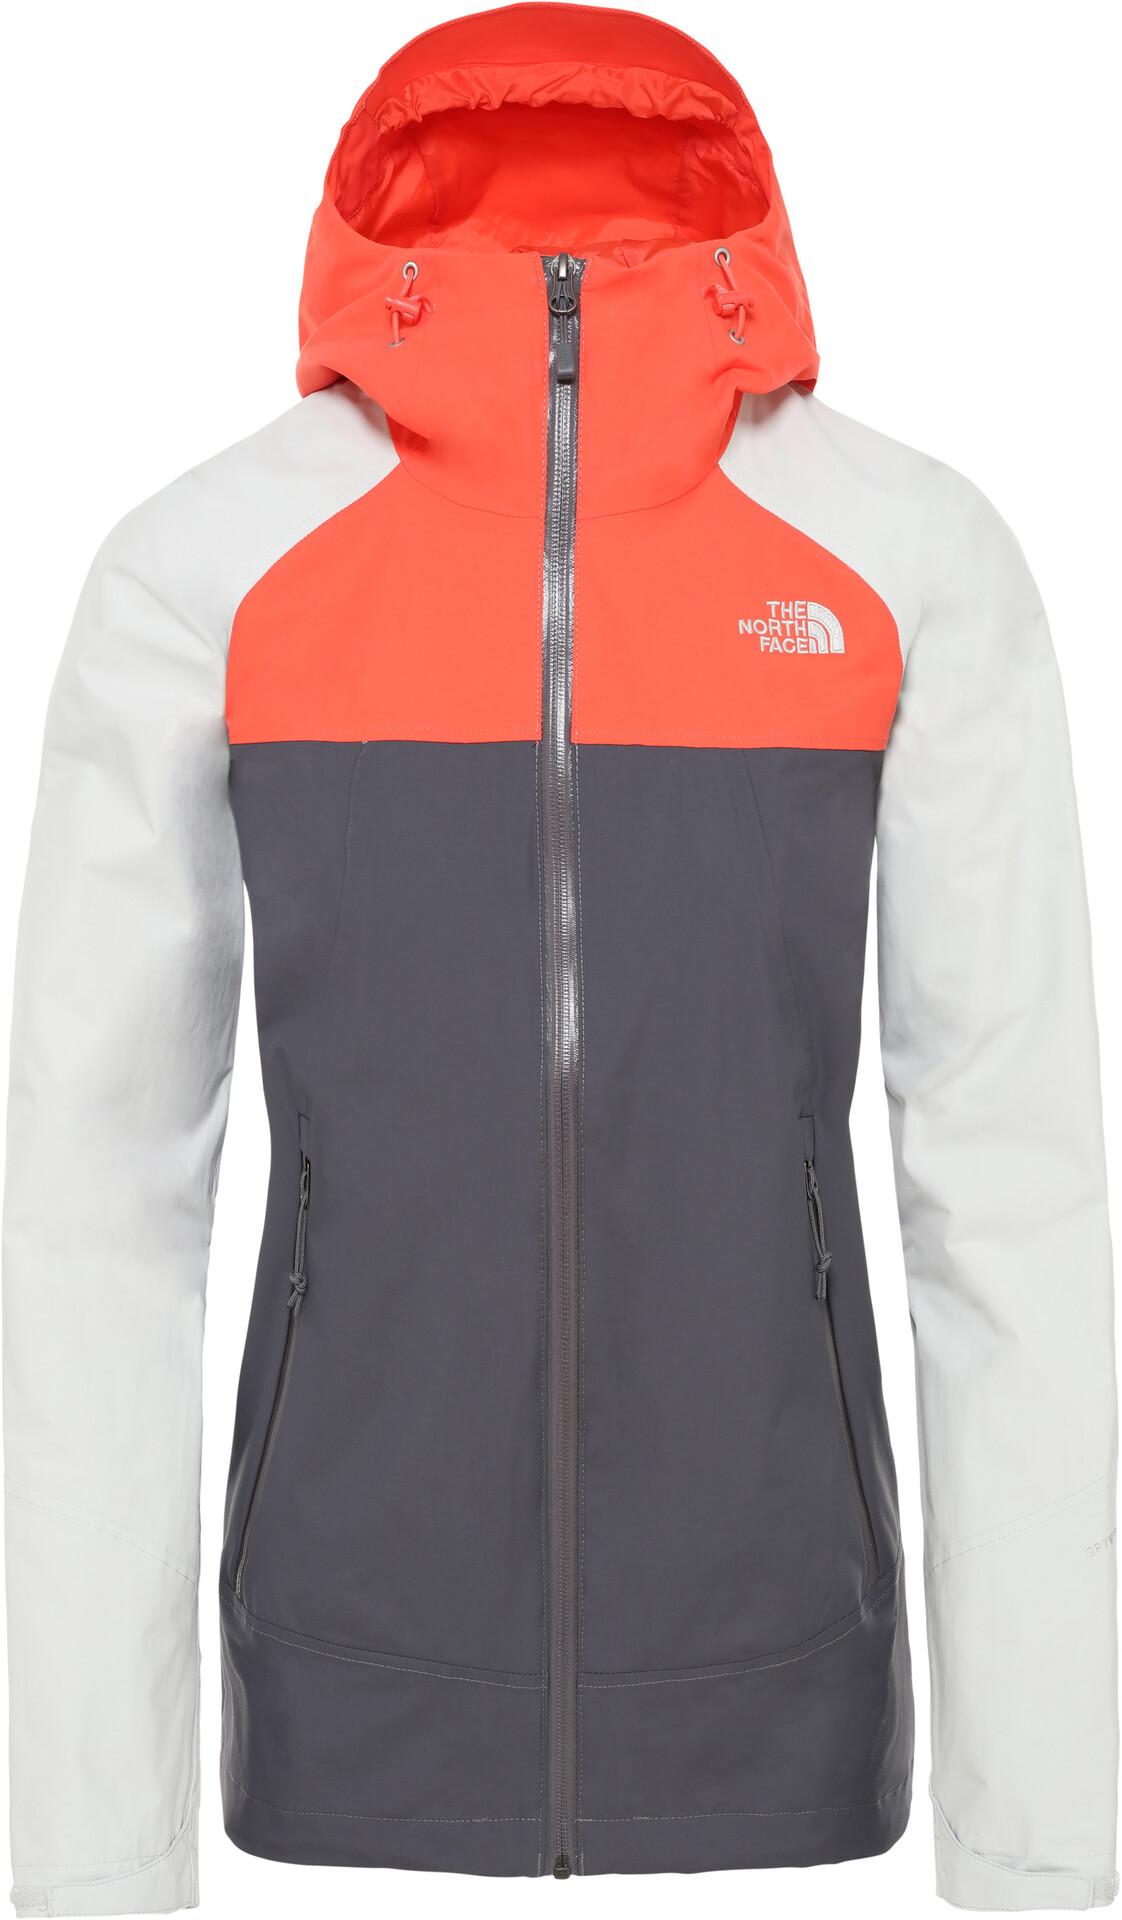 The North Face Stratos Jacke Damen vanadis greytin greyradiant orange